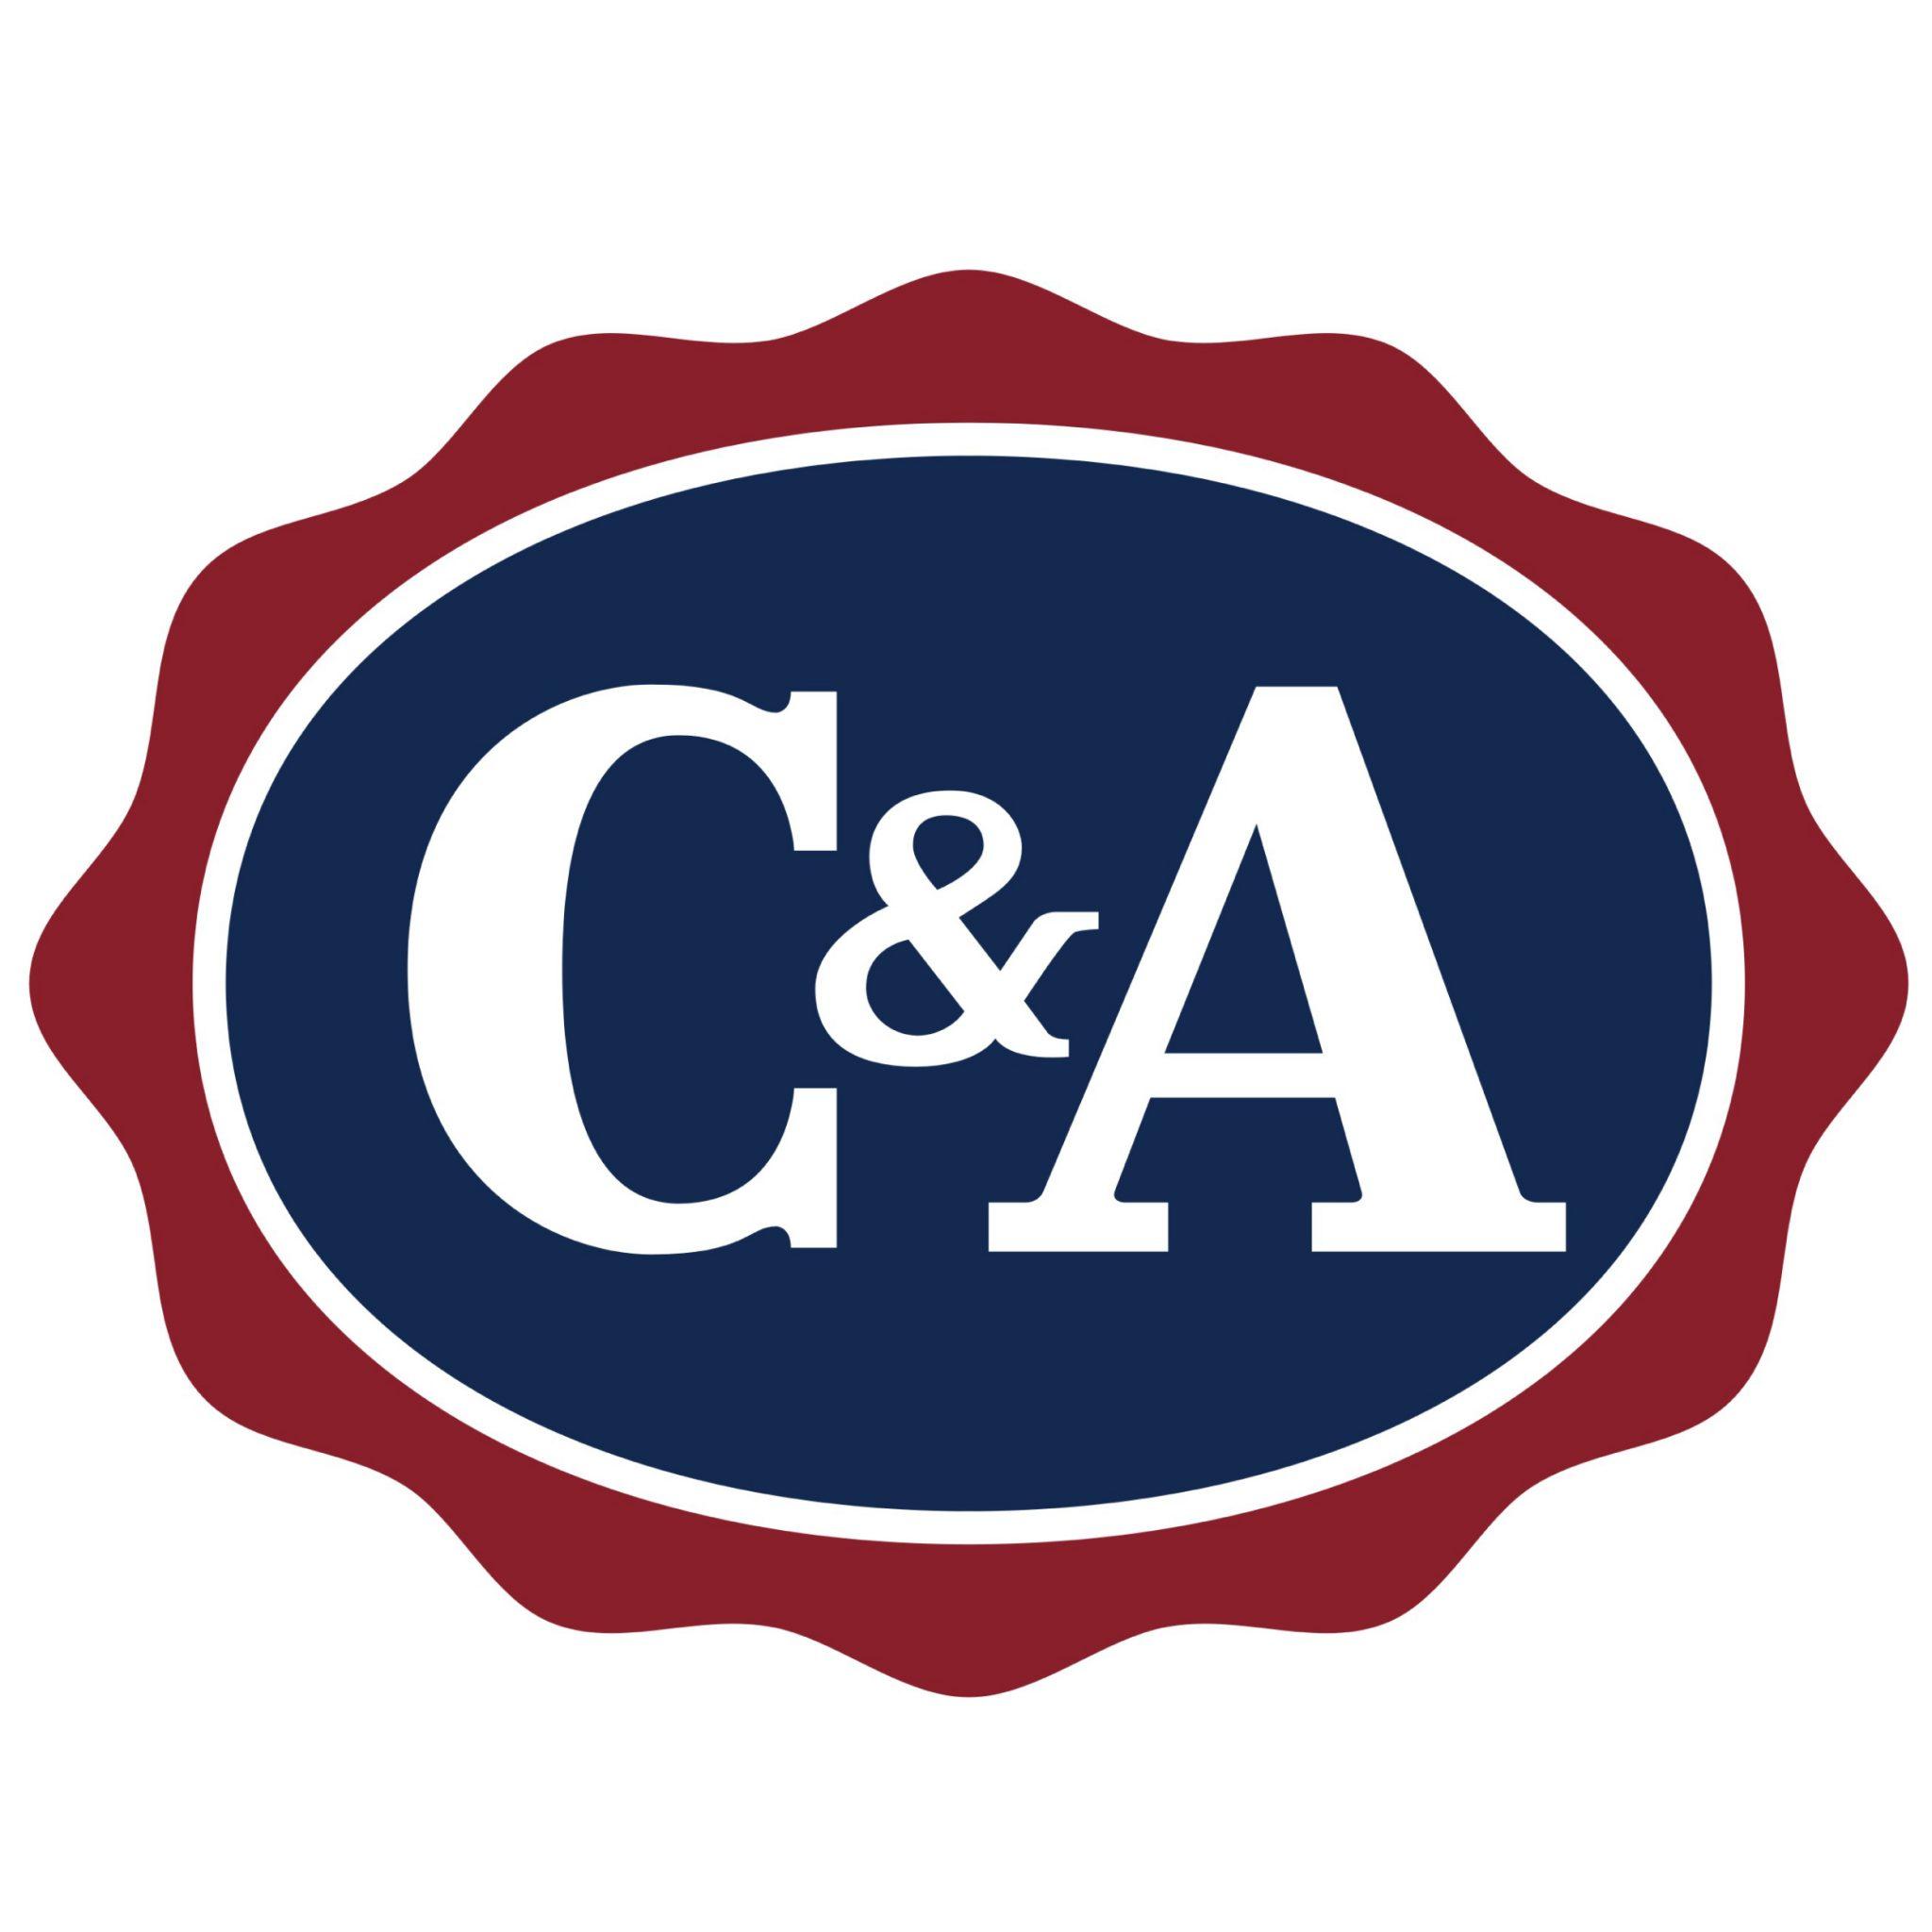 C&A Müşteri Hizmetleri Telefonu